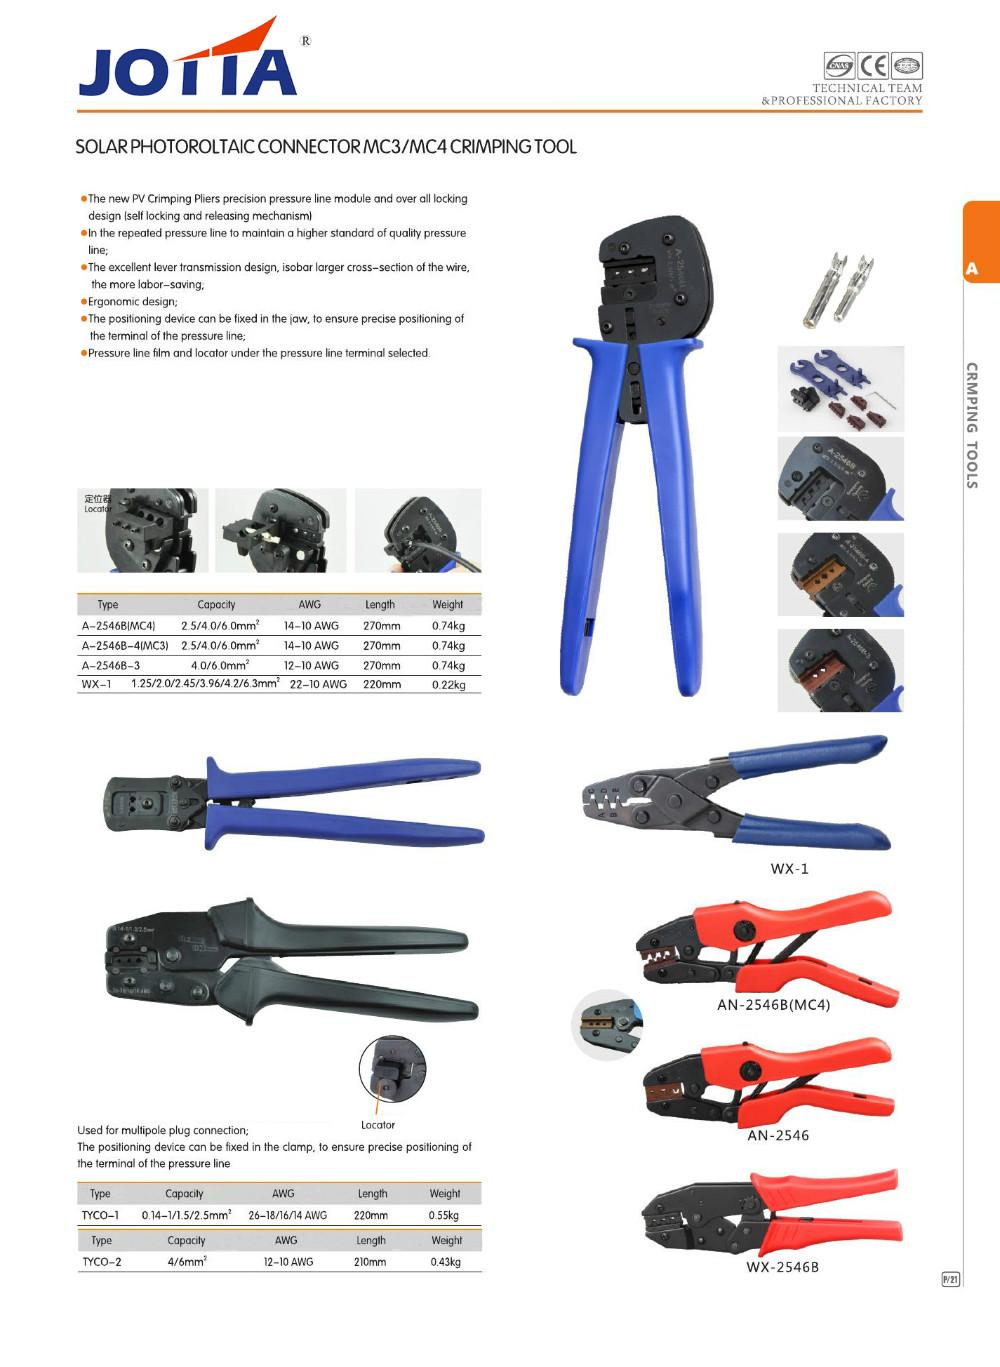 Solar Photoroltaic Connector MC3MC4 Crimping Tool 13B